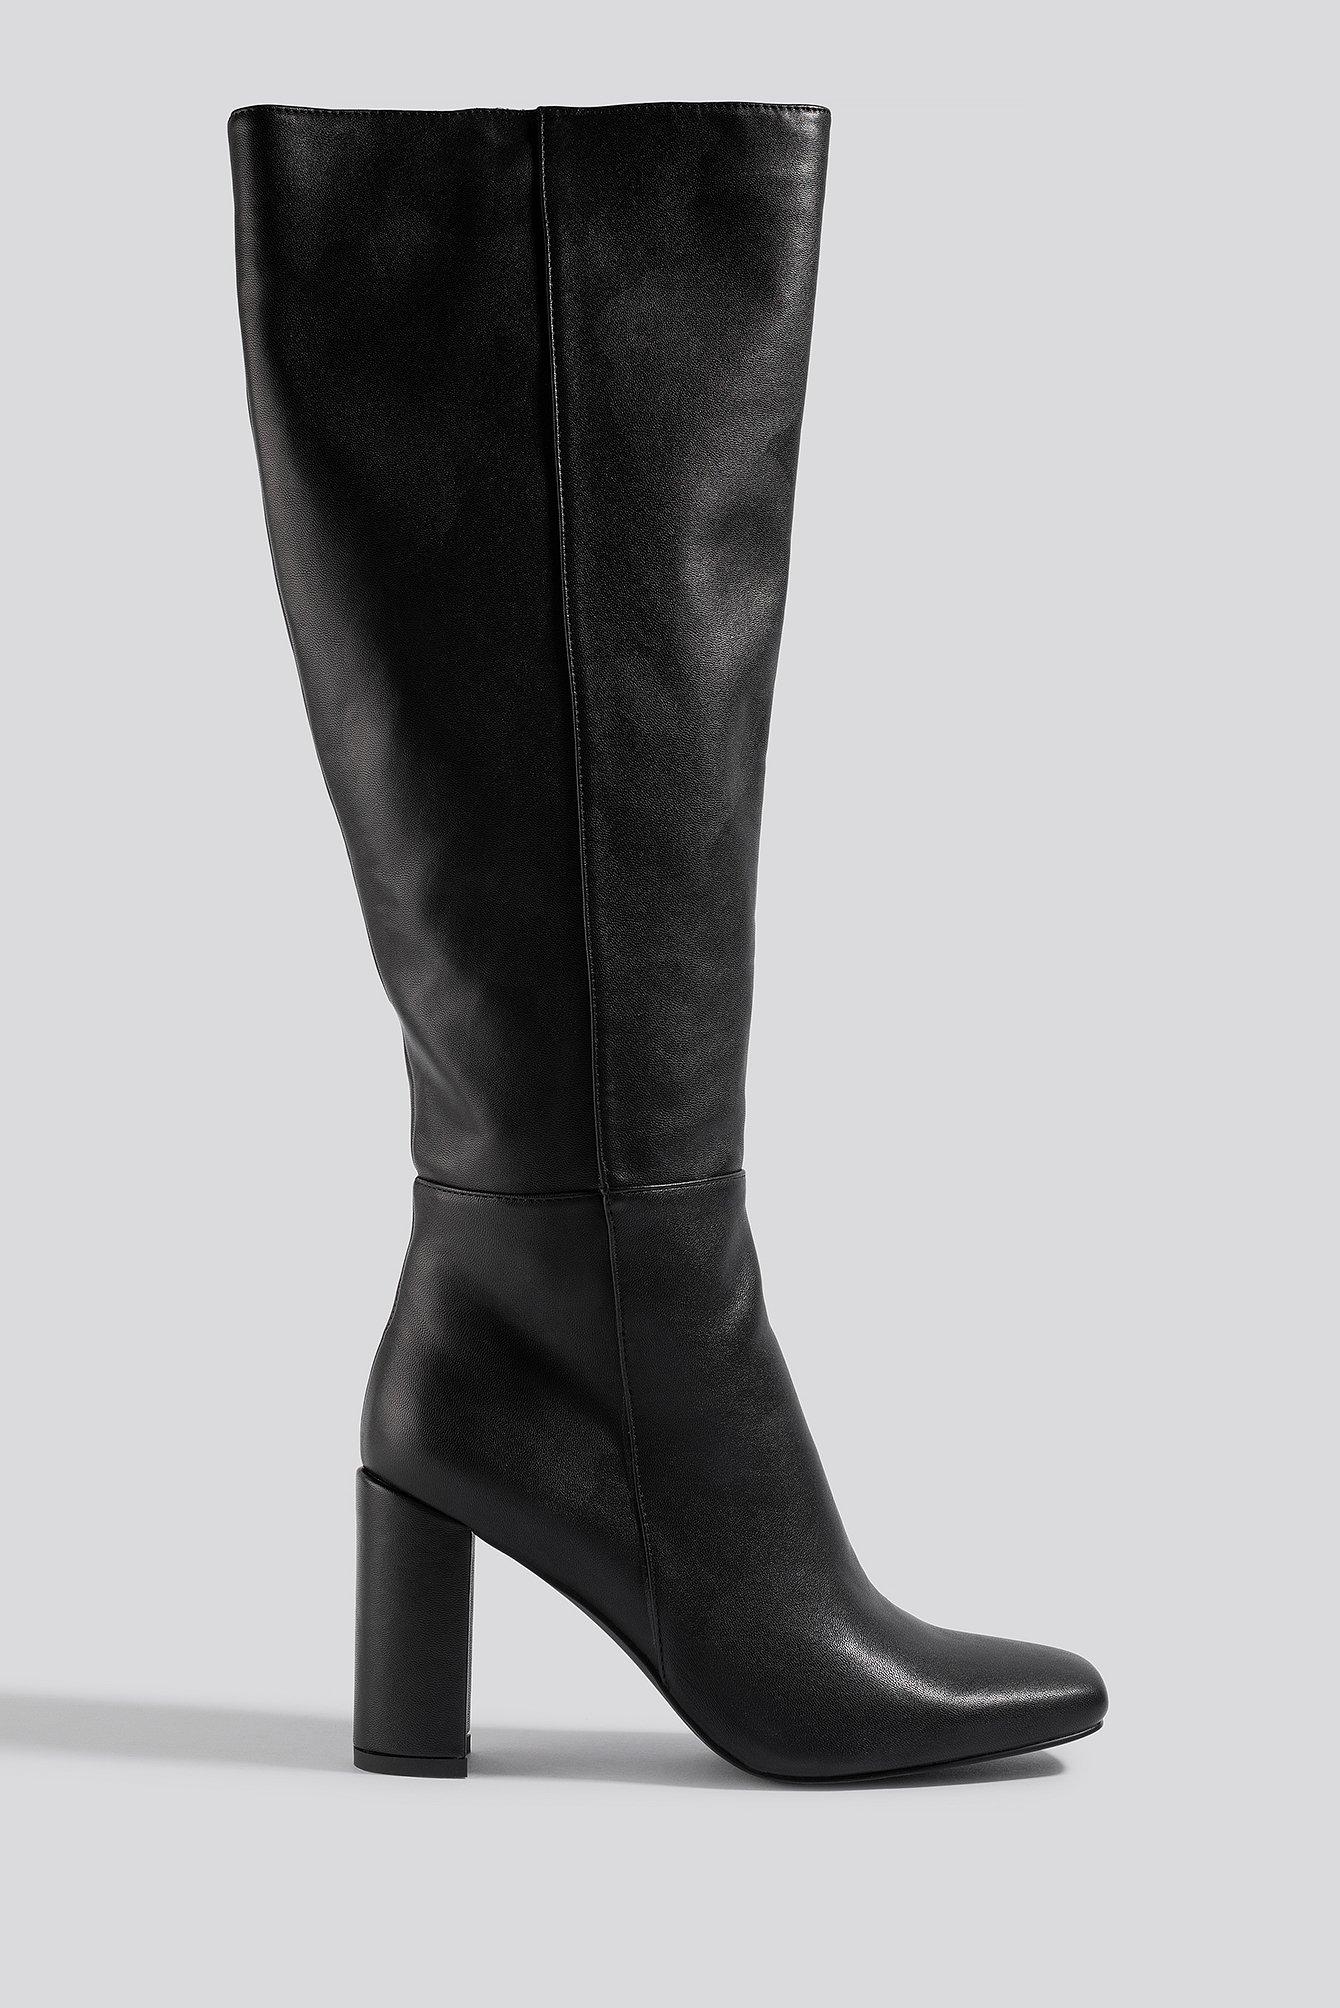 na-kd shoes -  Straight Shaft Knee High Boots - Black